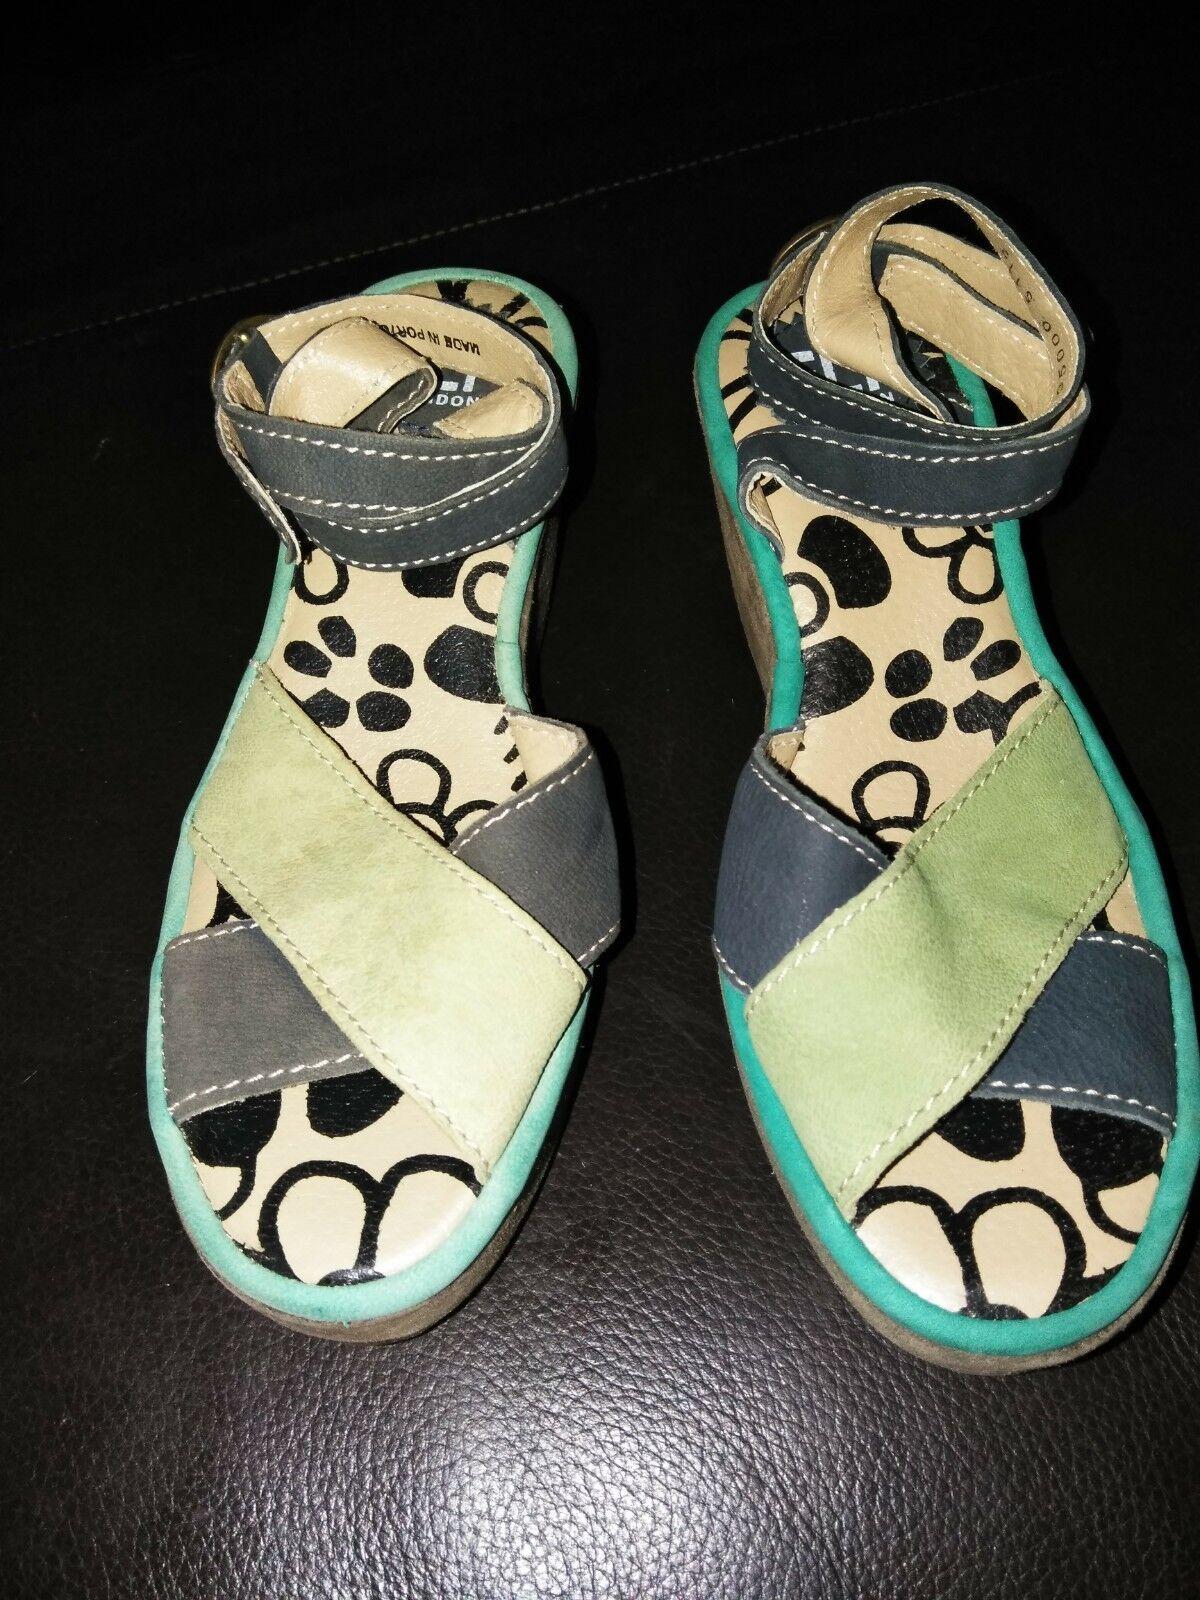 Fly London Pati Leder Ankle Strap Wedge Sandales Navy Blau/Green 6- 6.6 EU 37